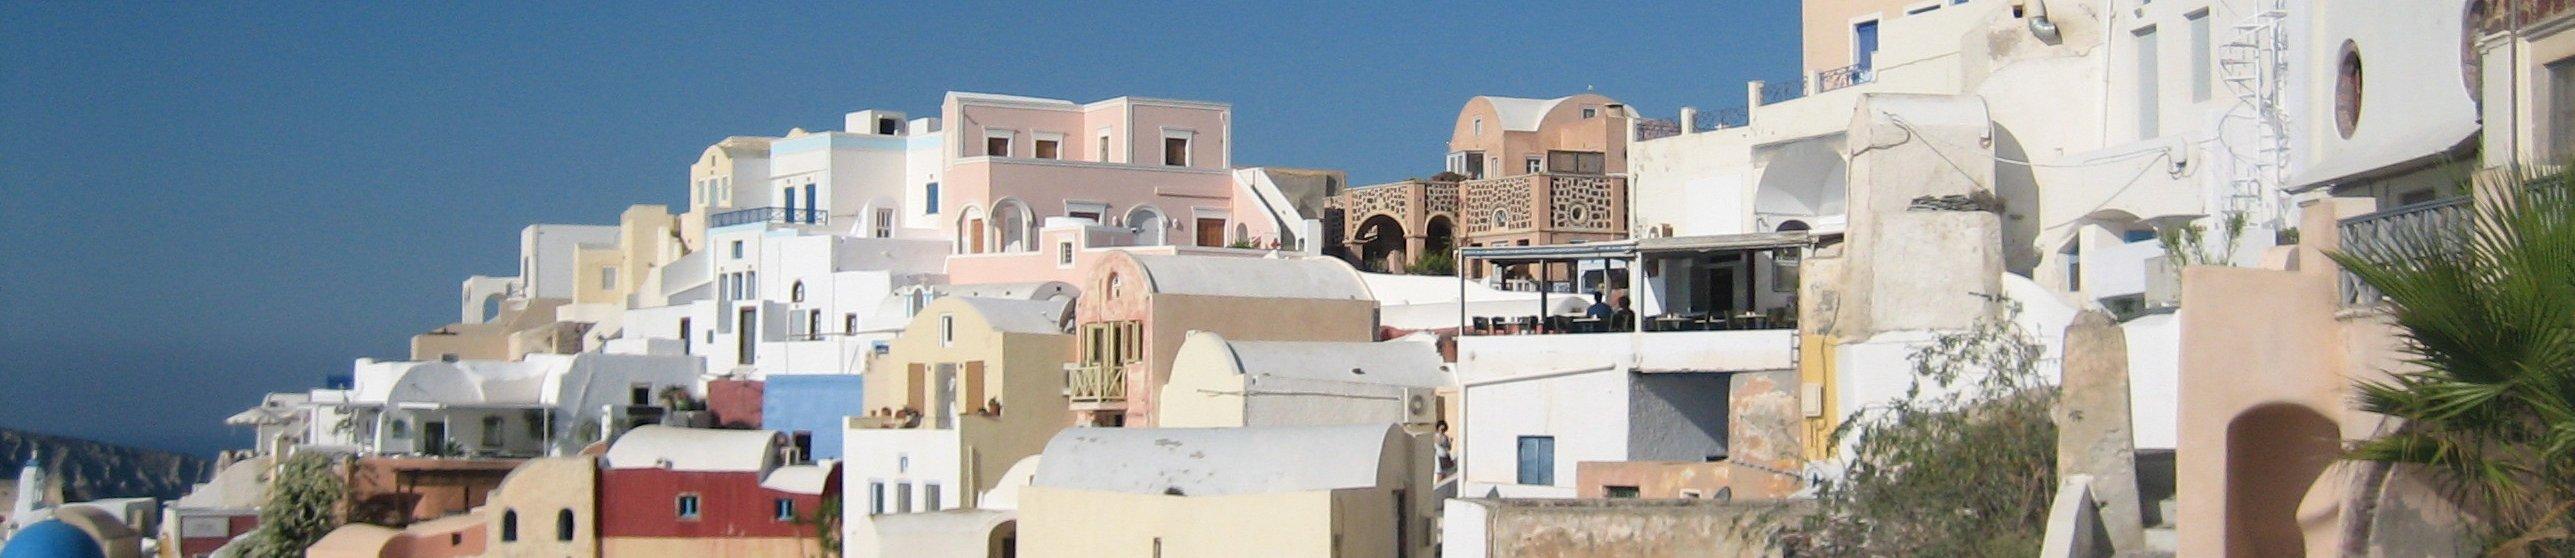 Greece banner image